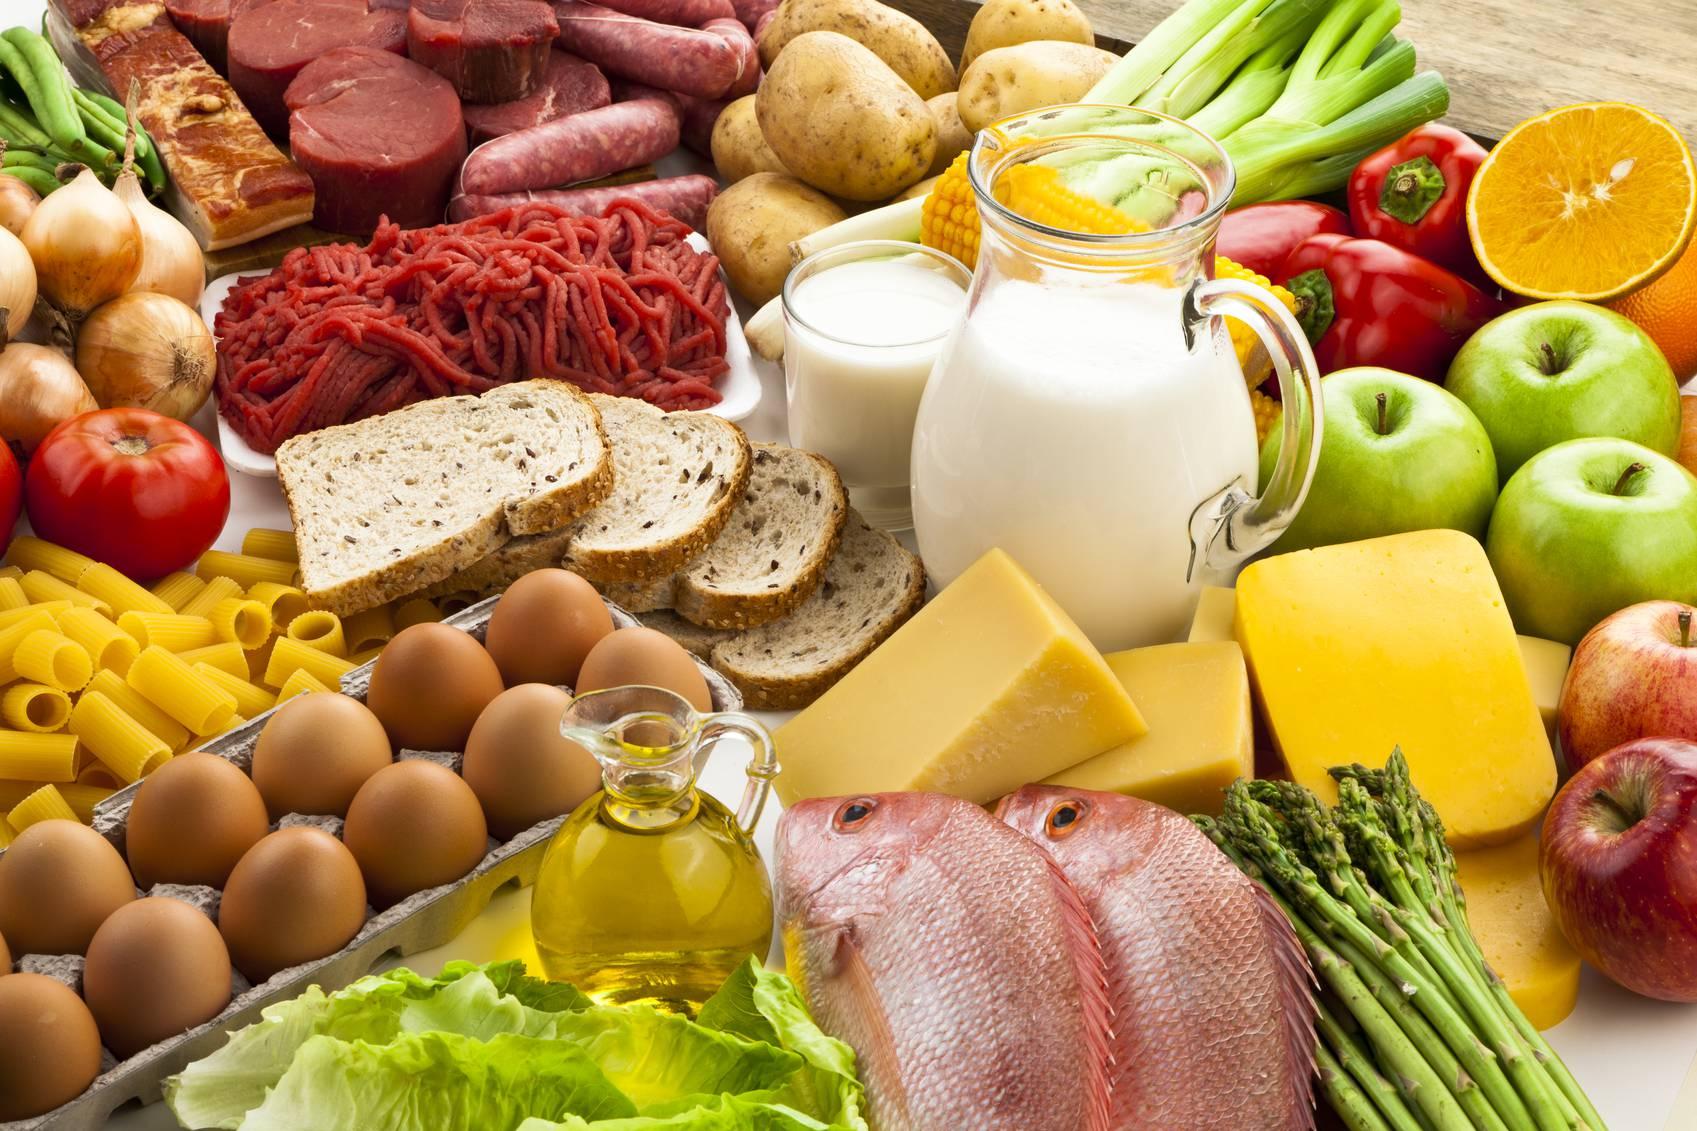 dieta per gruppi sanguigni b